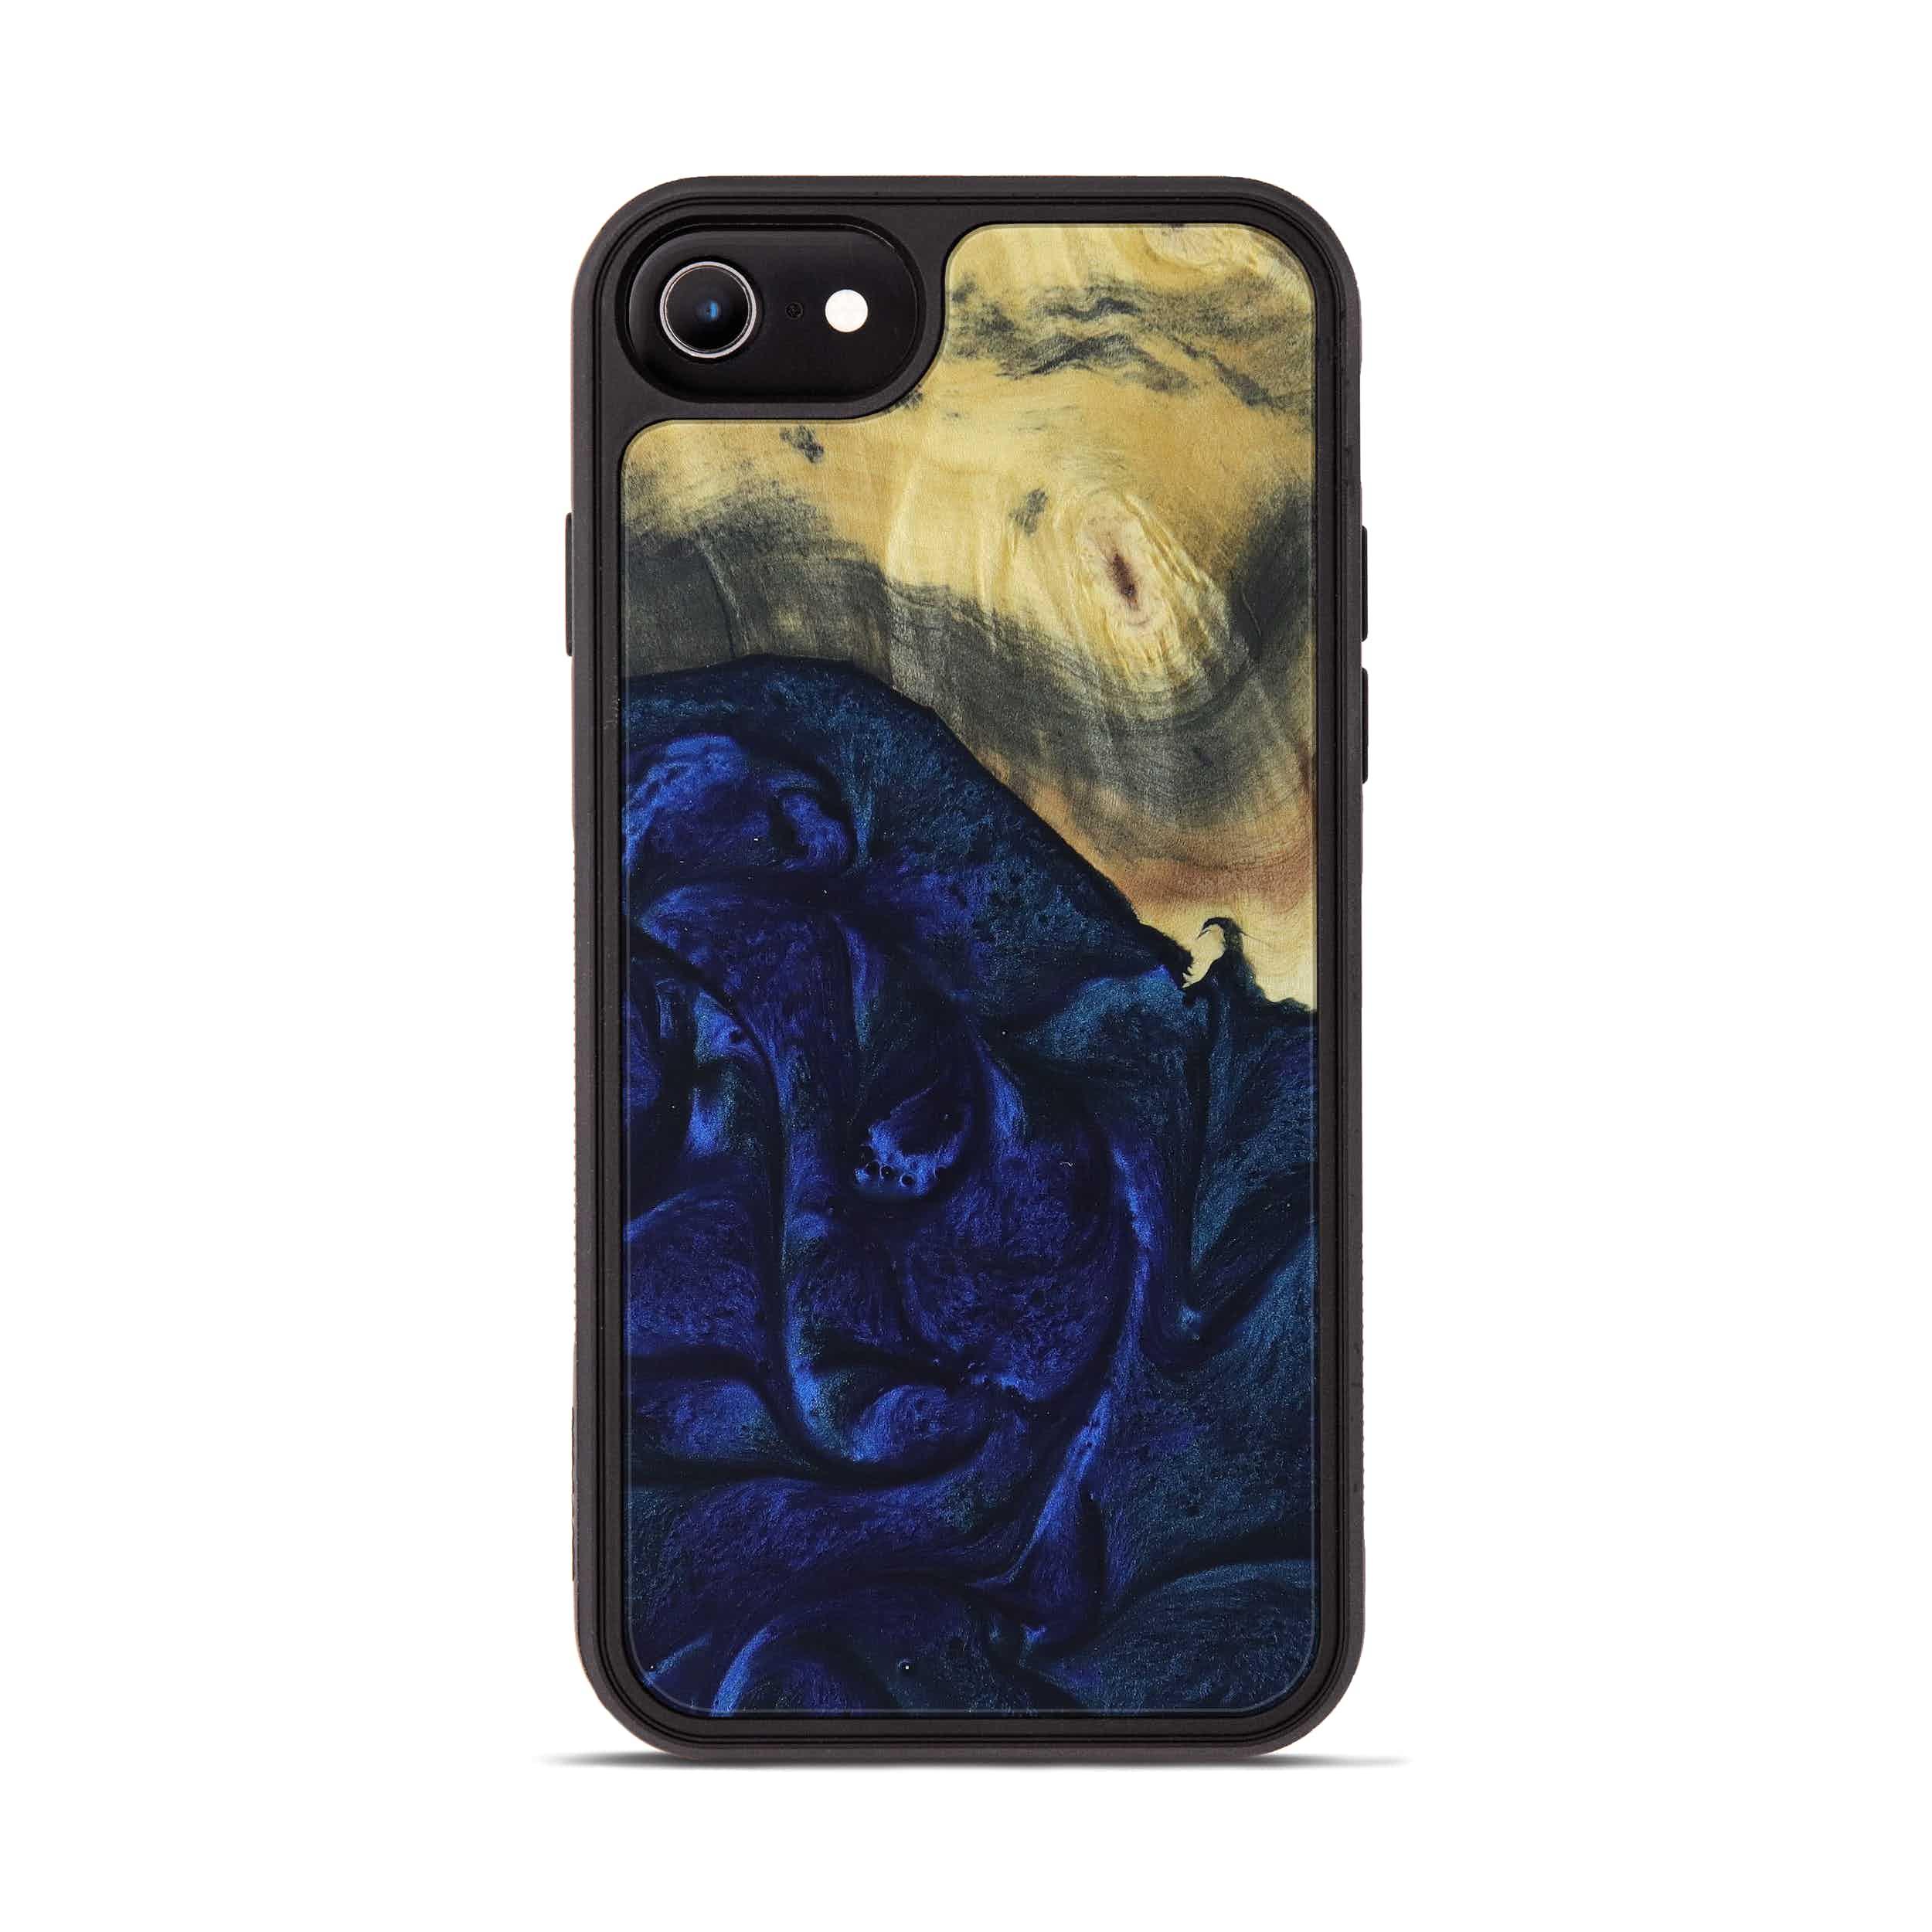 iPhone 6s Wood+Resin Phone Case - Lalit (Dark Blue, 397884)